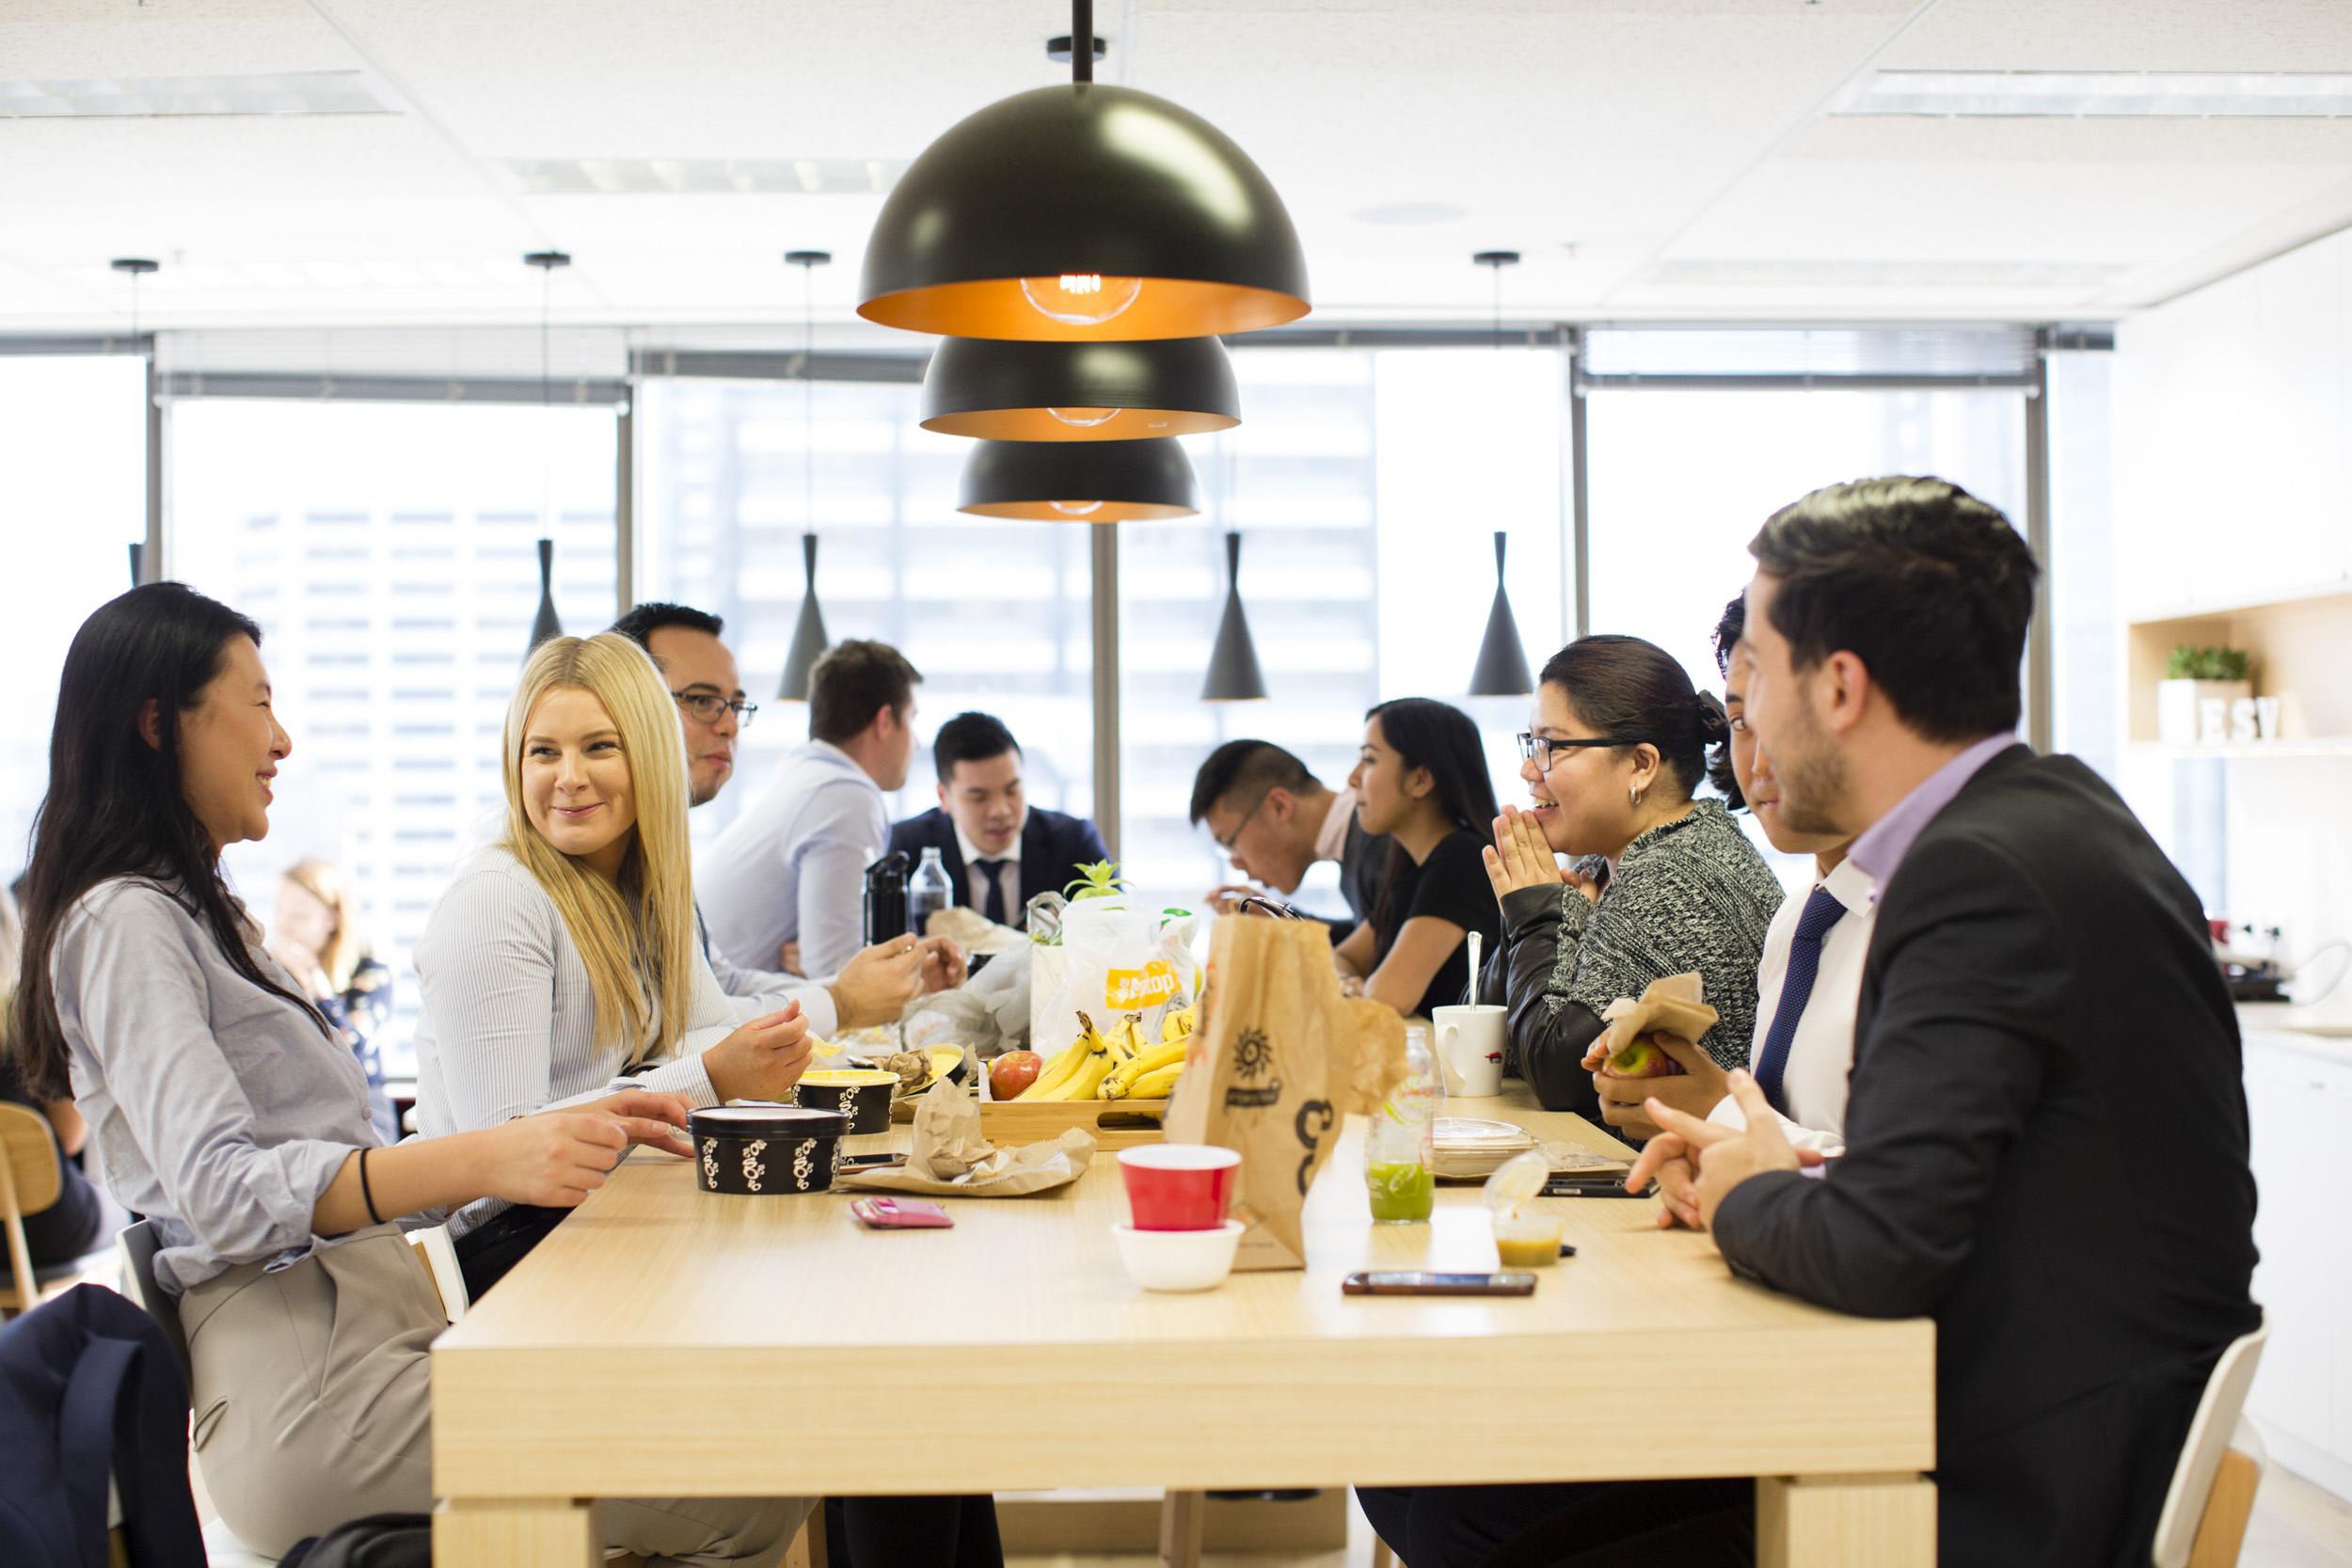 workplace-staff-portraits-Sydney-Australia_05.jpg